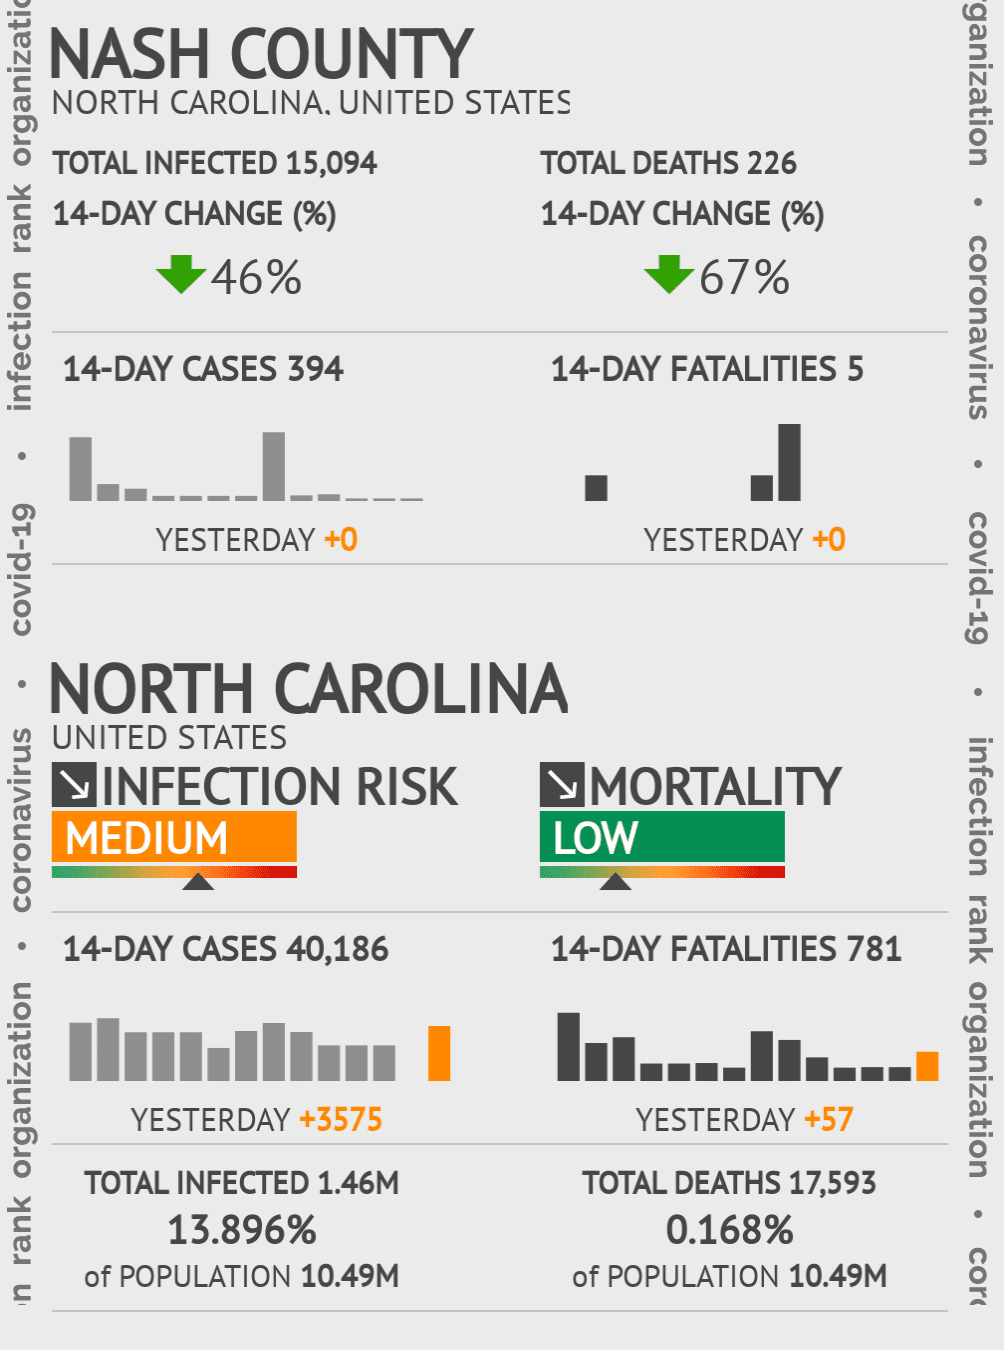 Nash County Coronavirus Covid-19 Risk of Infection on January 17, 2021